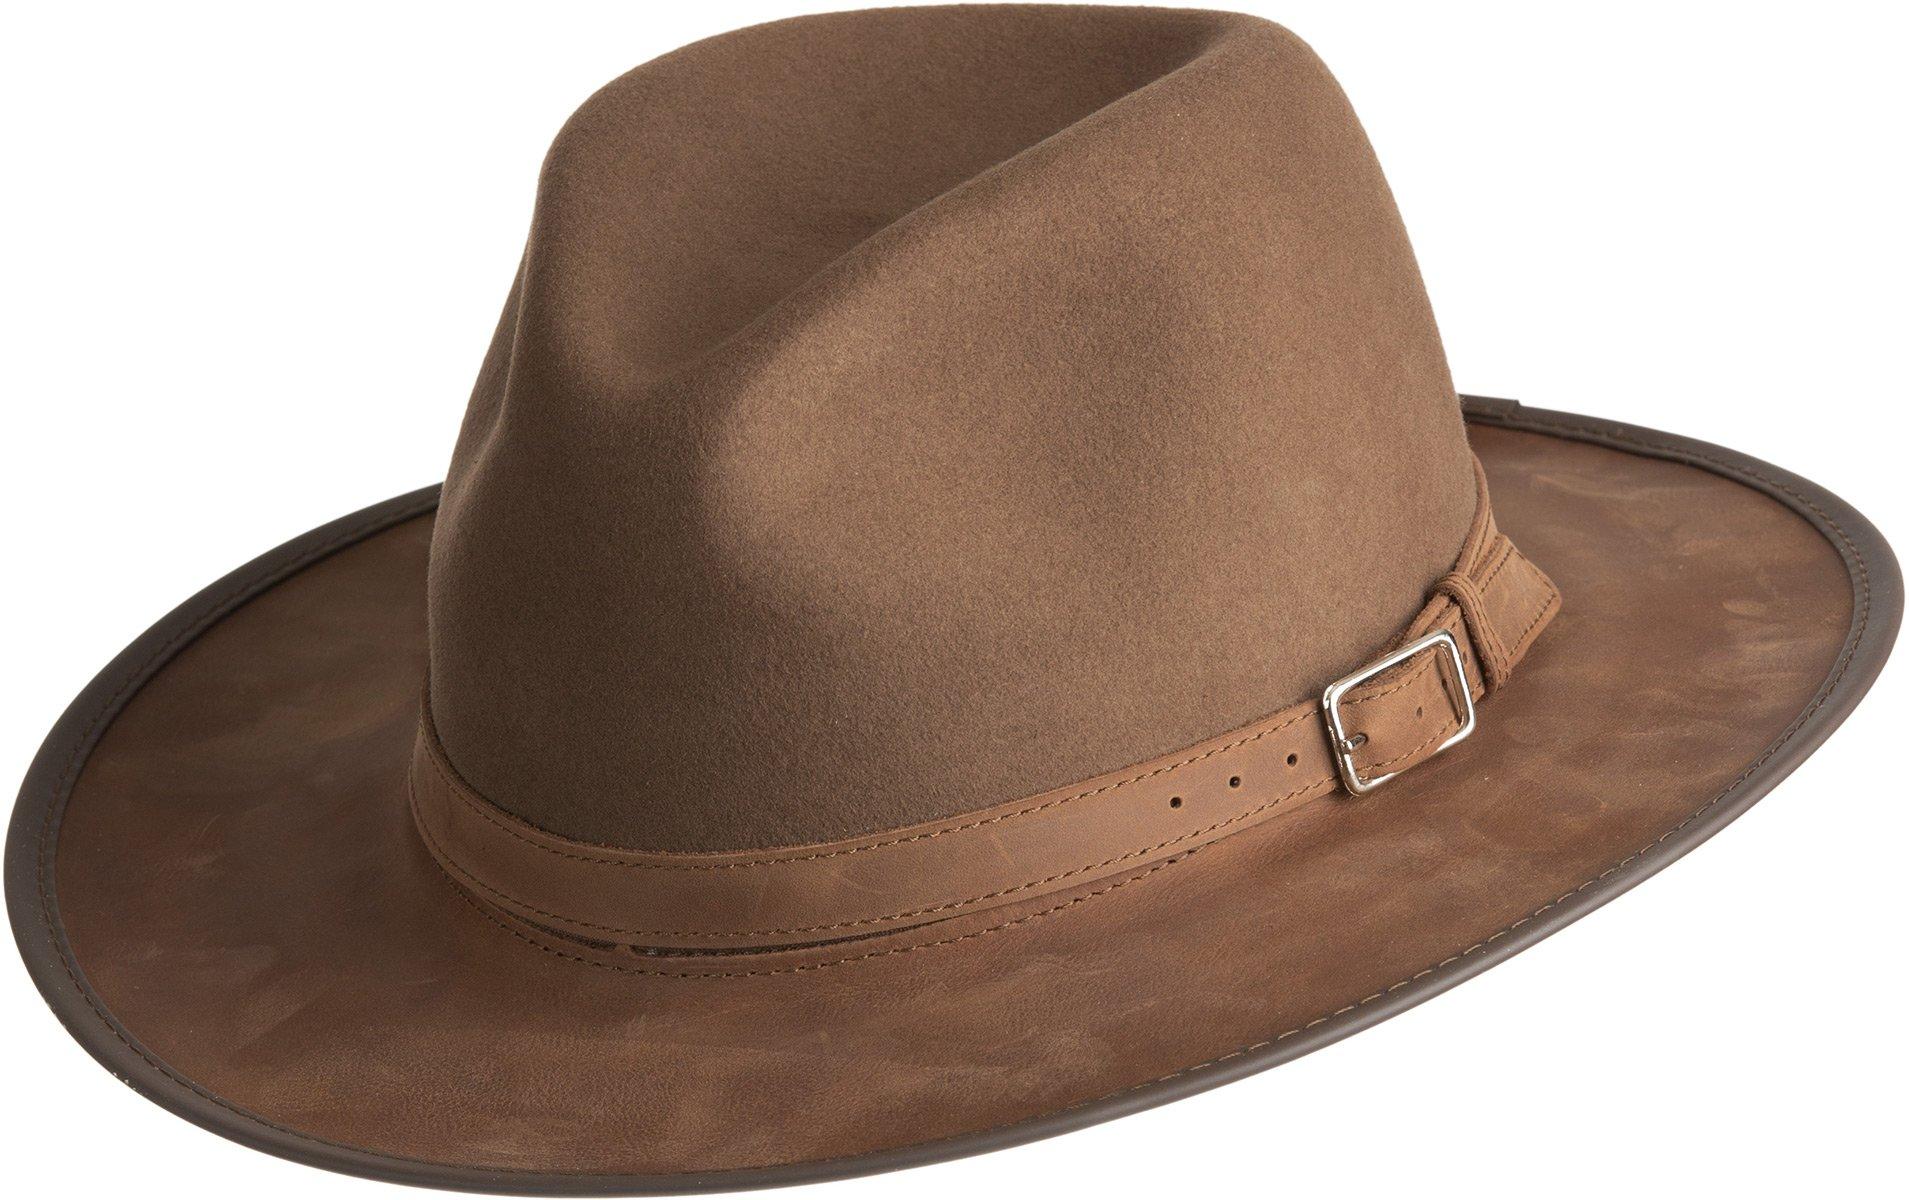 Overland Sheepskin Co Summit Wool Felt and Leather Safari Hat